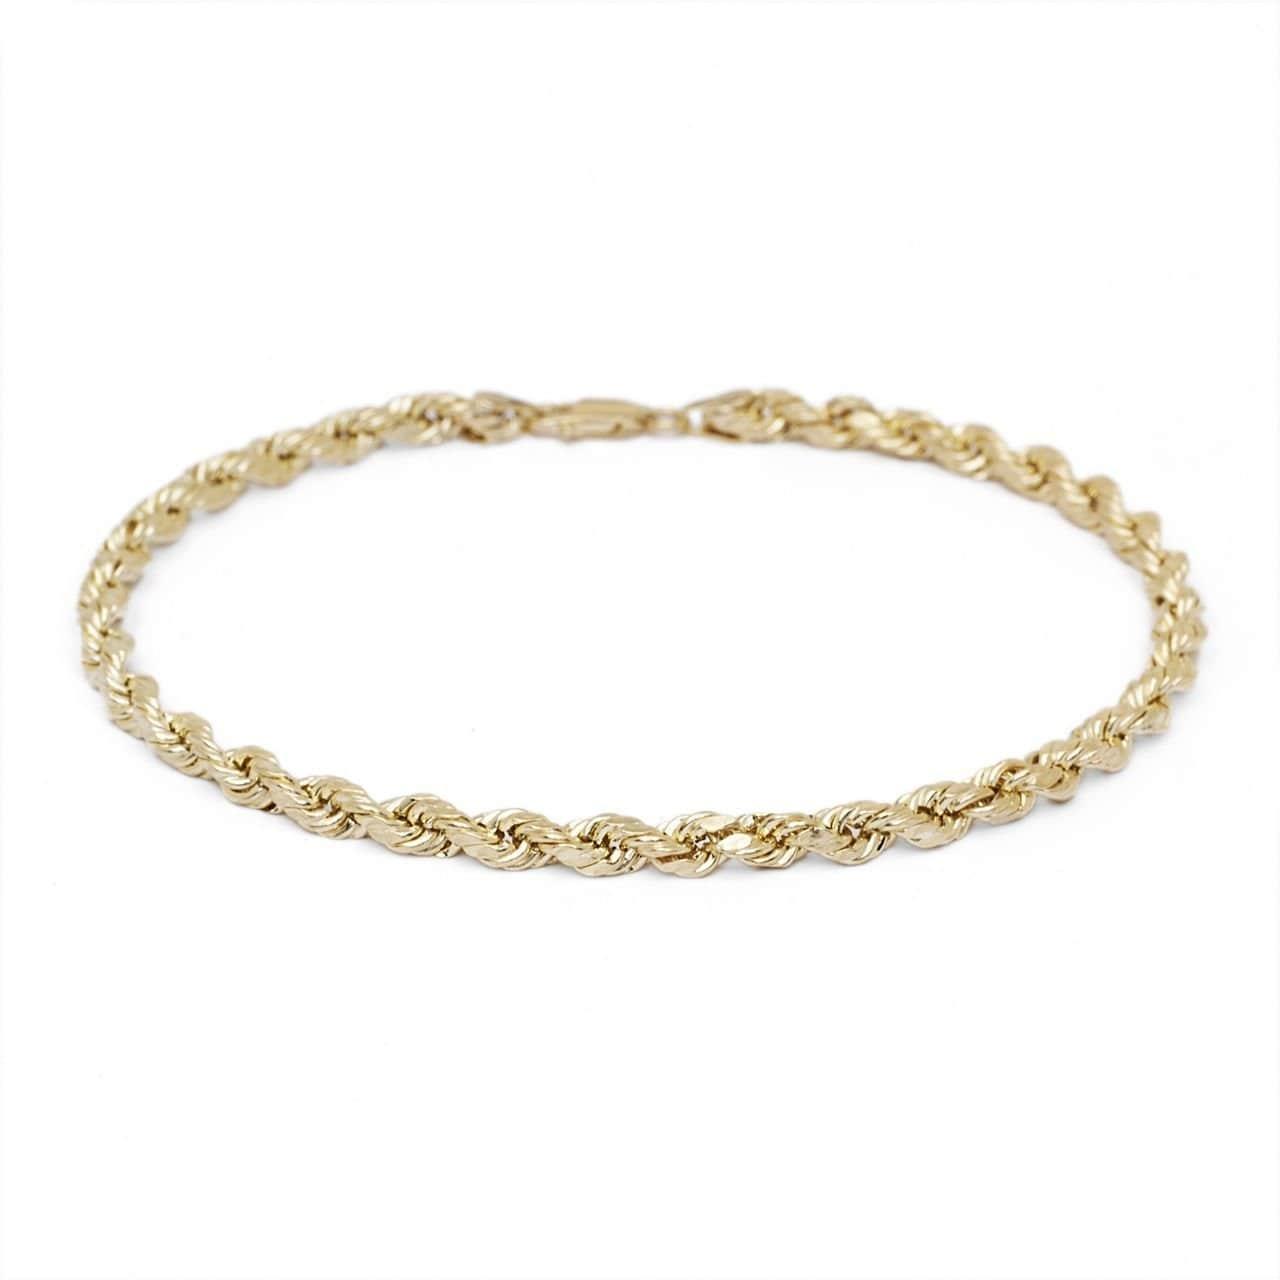 51ed2cd2882aa Mcs Jewelry Inc 14 KARAT YELLOW GOLD SOLID DIAMOND CUT ROPE CHAIN BRACELET  (2.5MM)